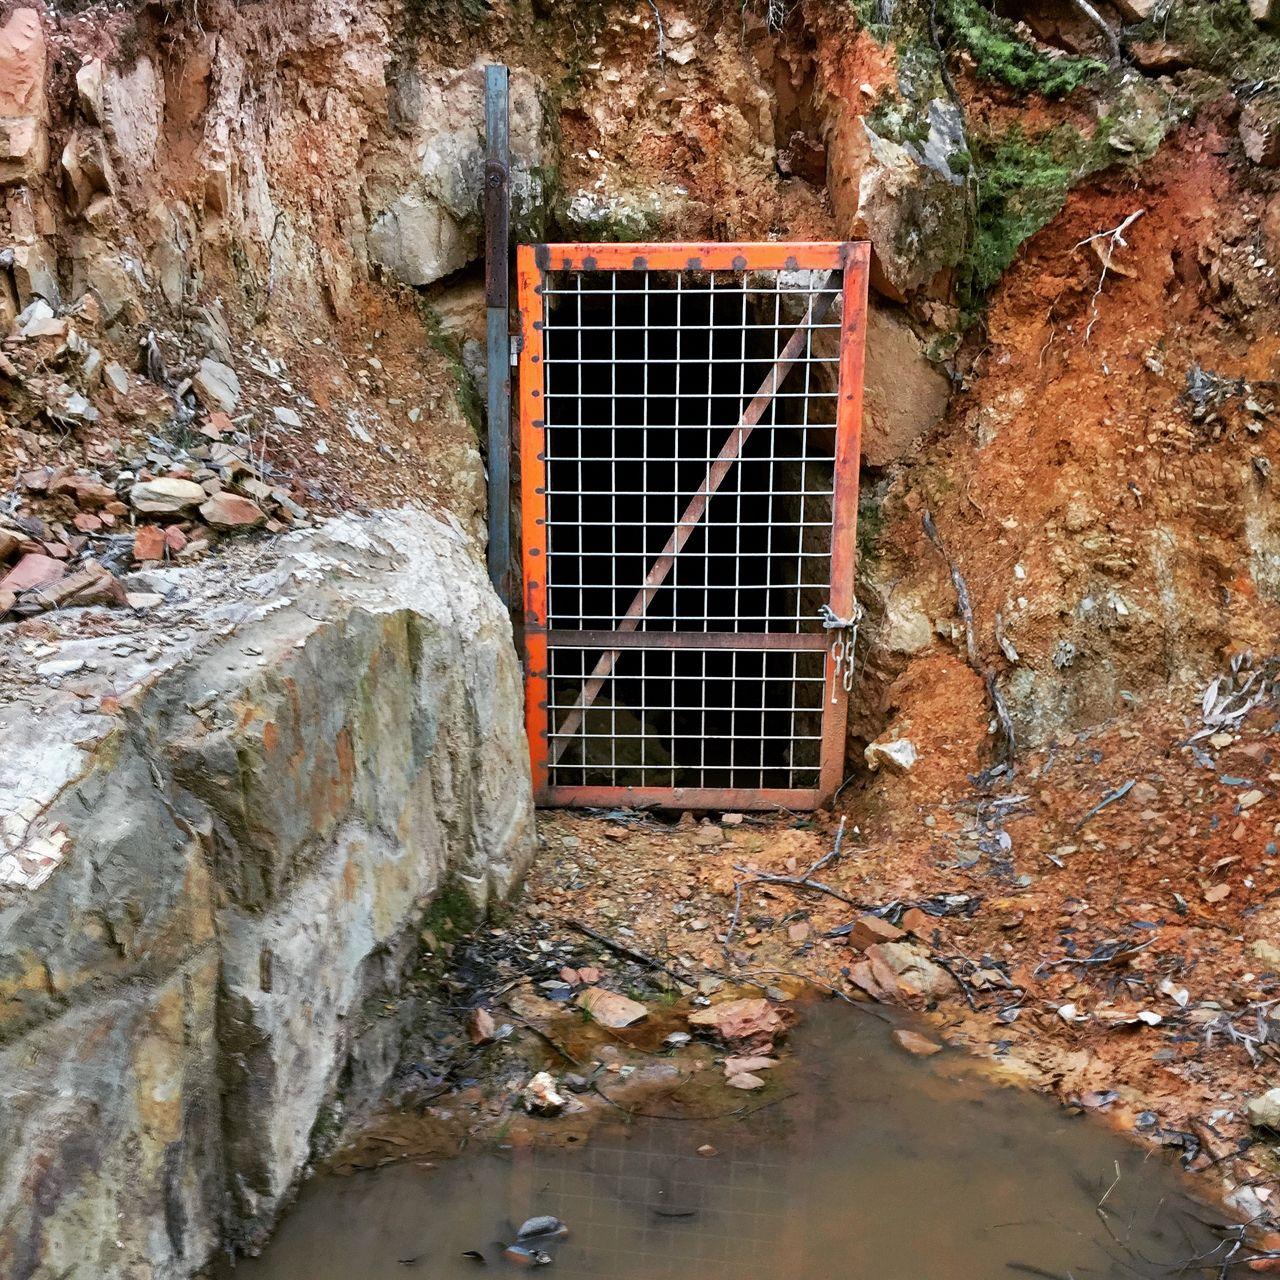 Exploring an old mine at #Daylesford near Ballarat  #Ballarat